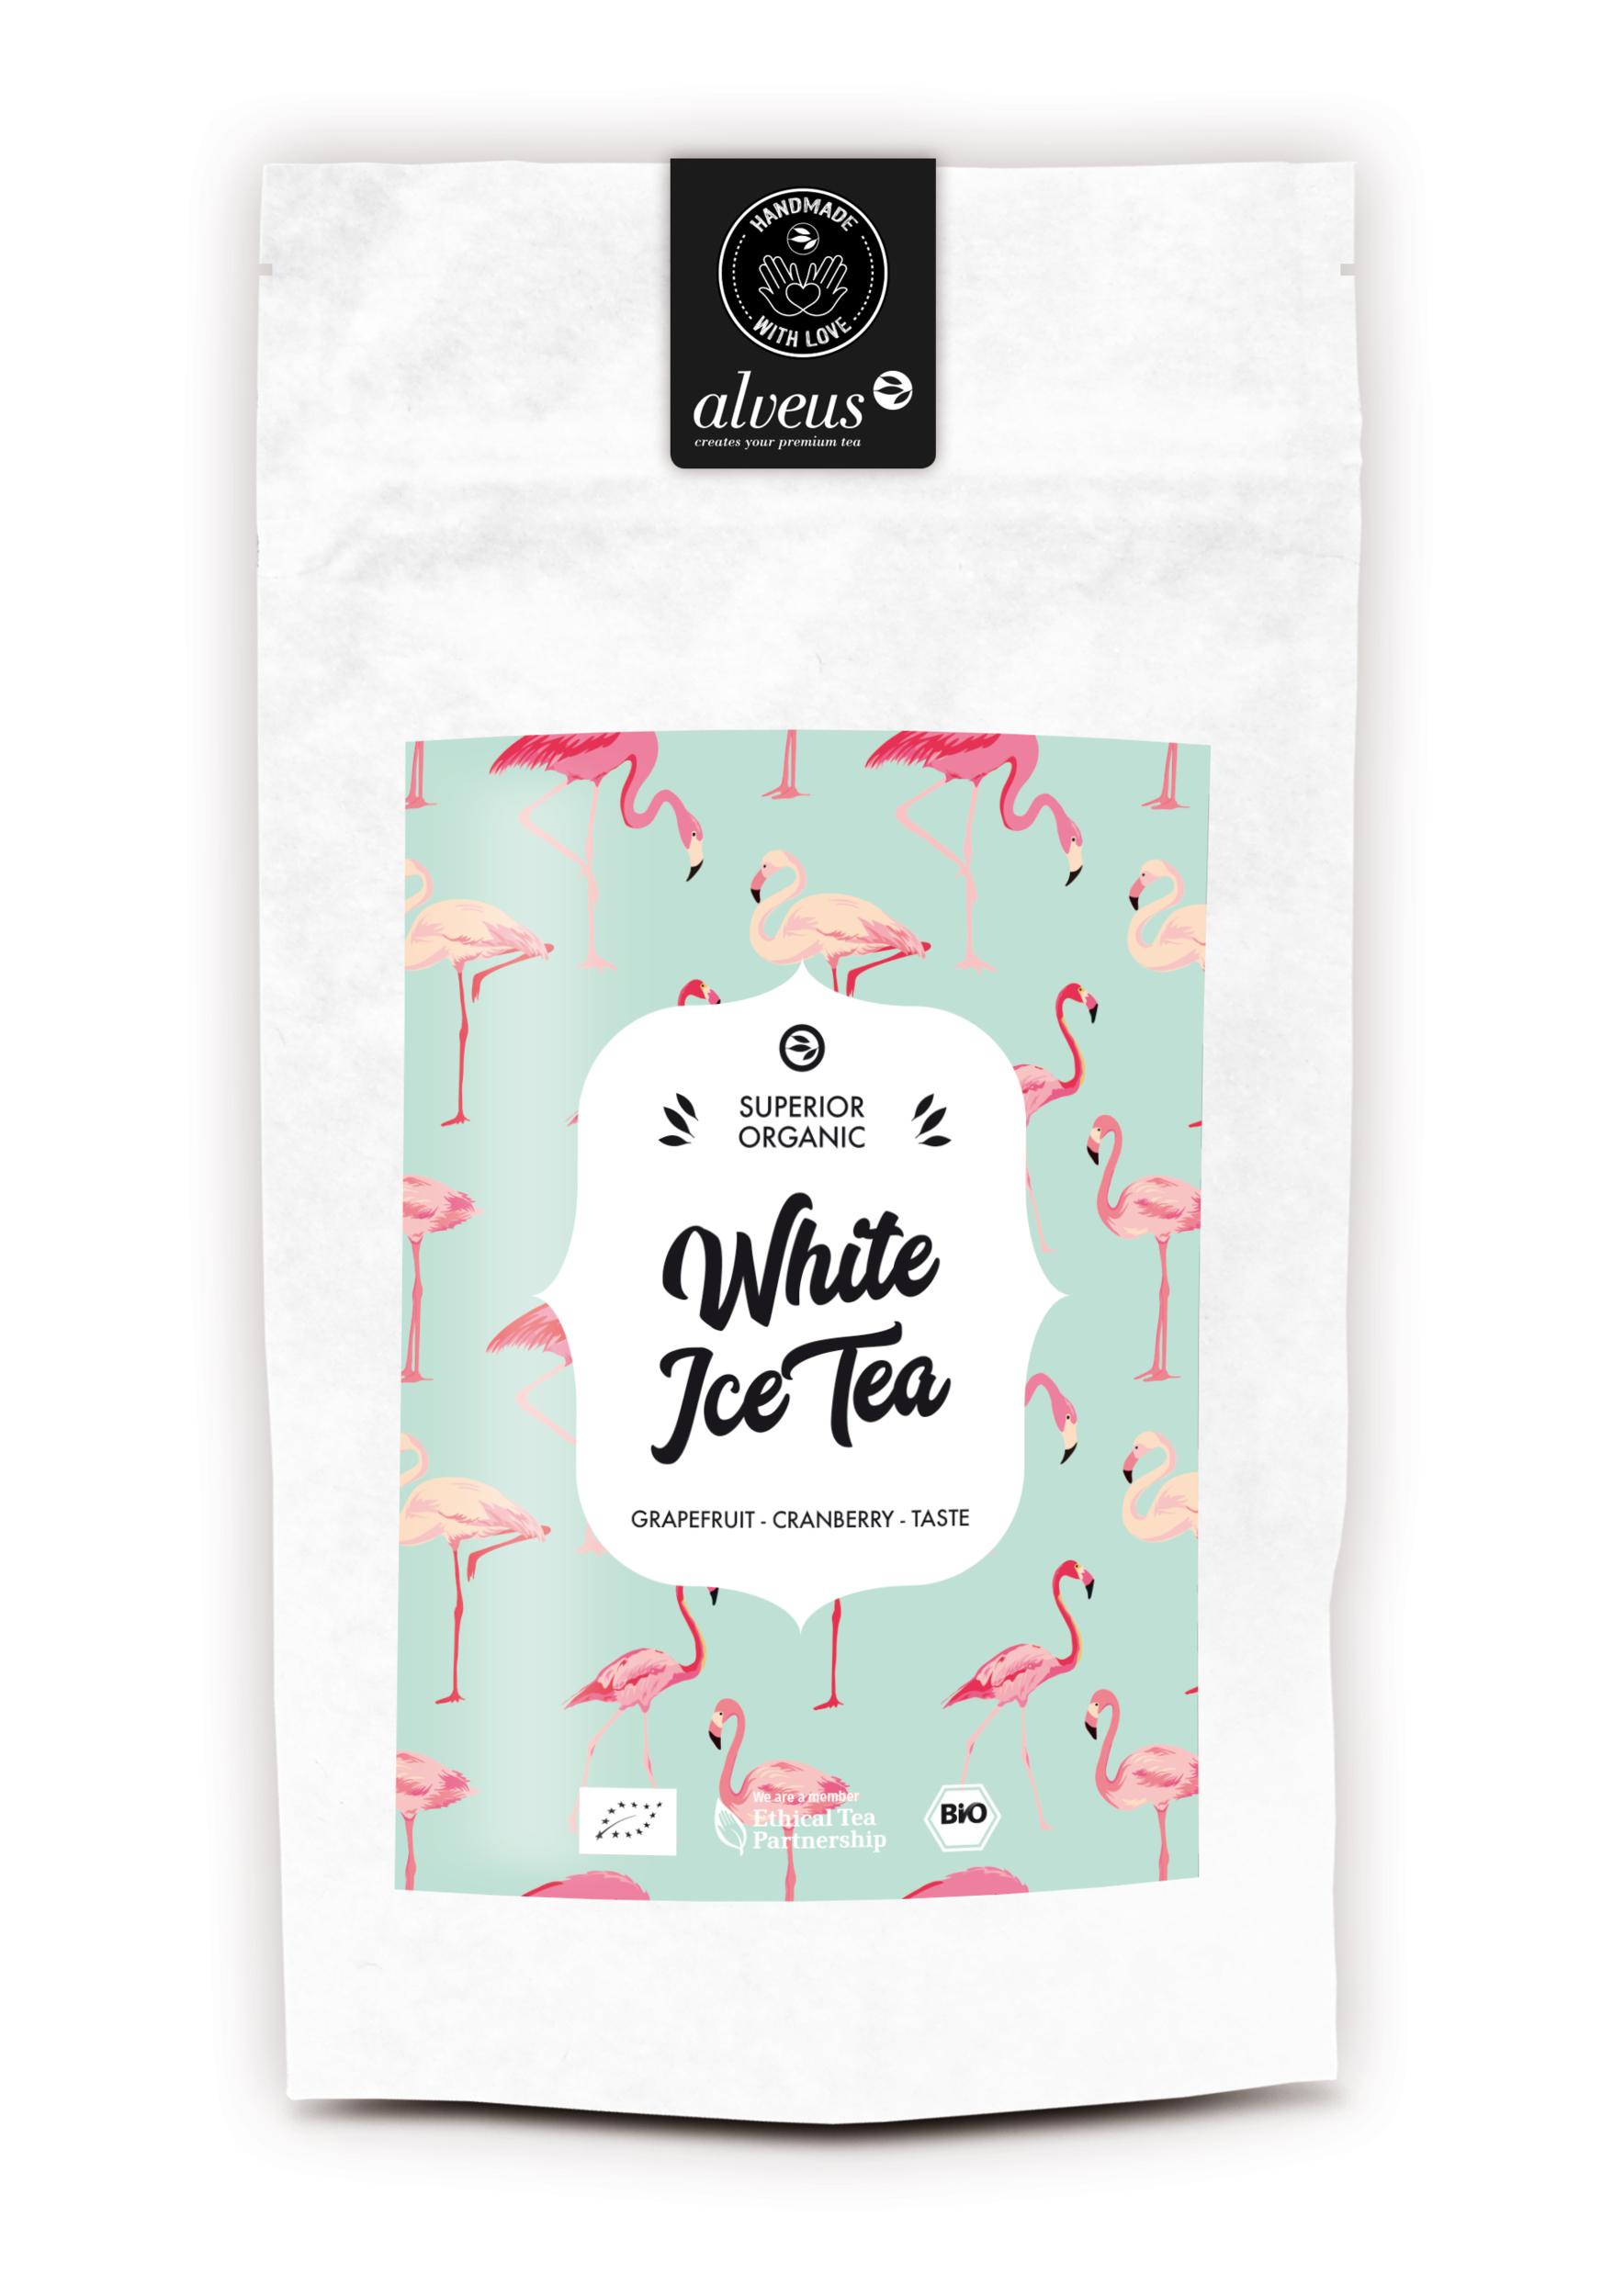 Thé glacé bio WHITE ICE TEA